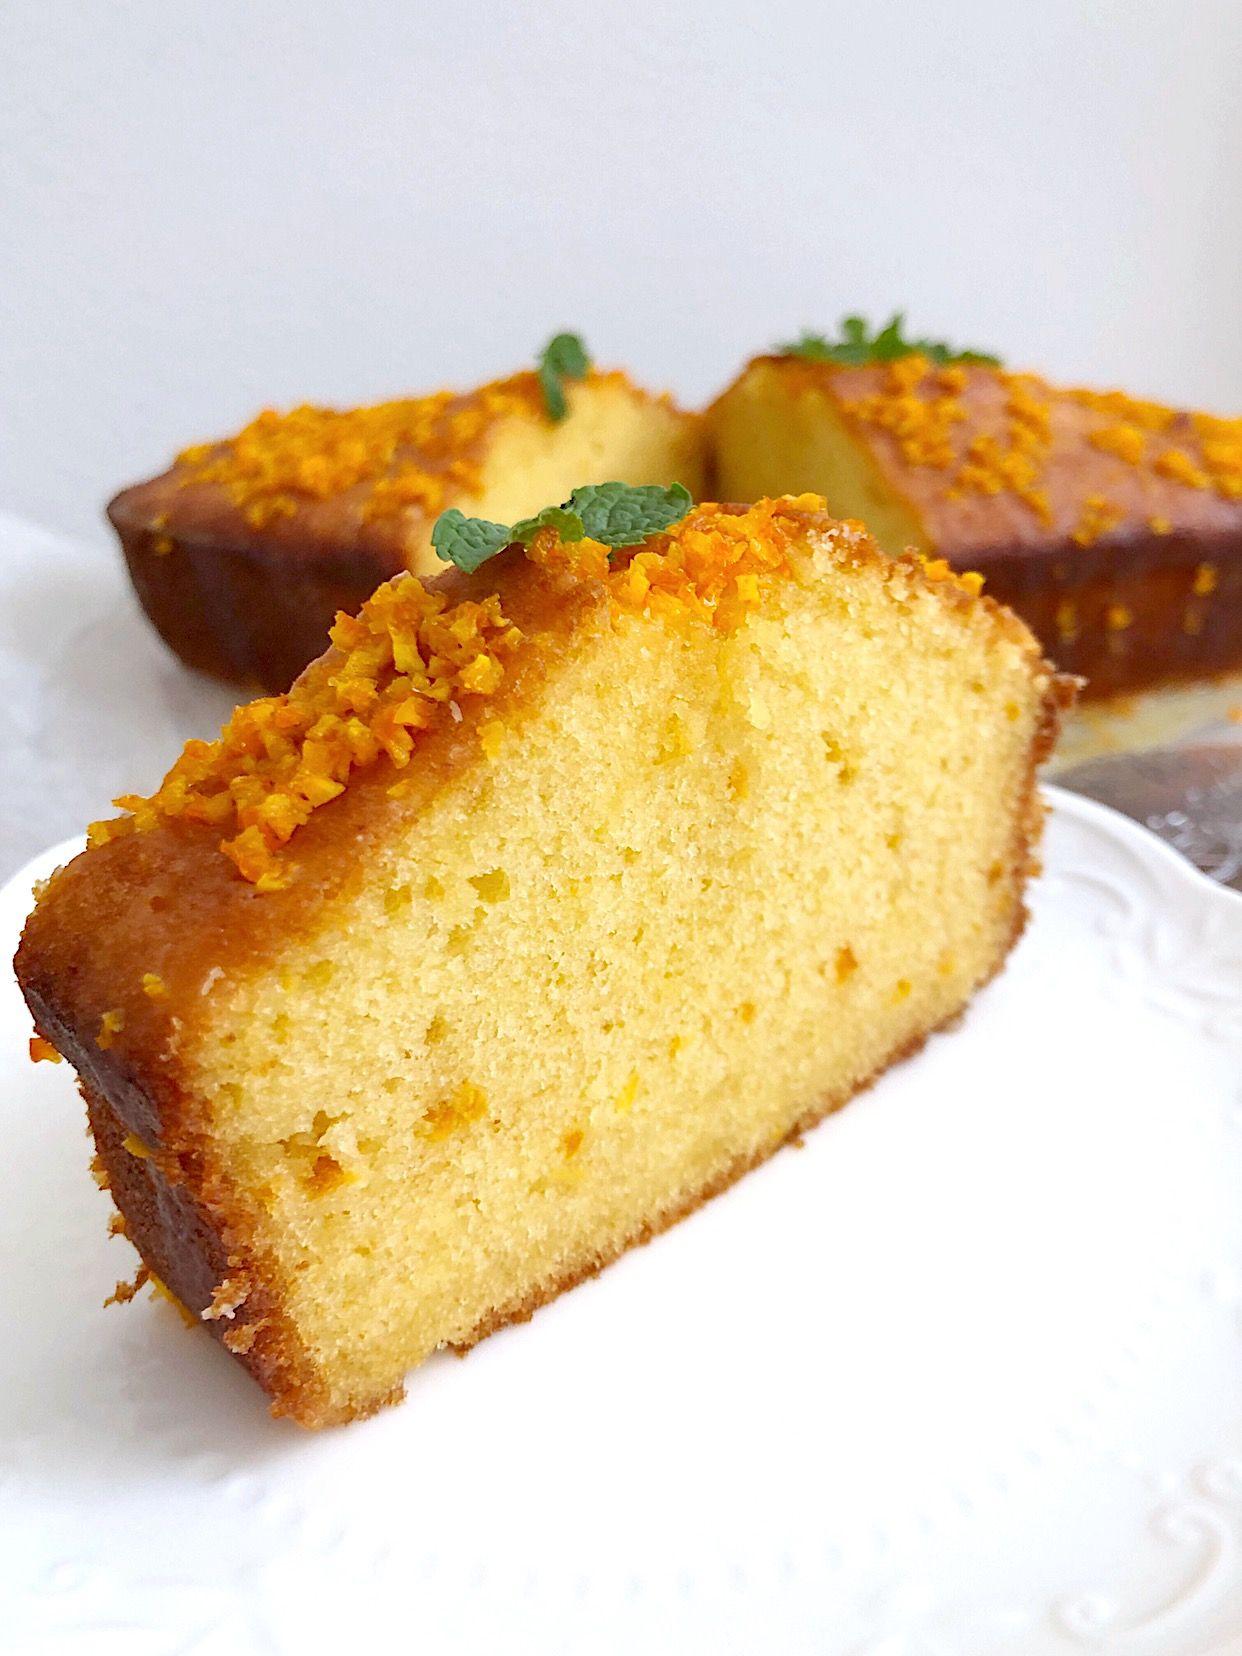 Mandarin Orange Pound Cake With A Zesty Orange Glaze Mandarin Orange Pound Cake Orange Pound Cake Orange Pound